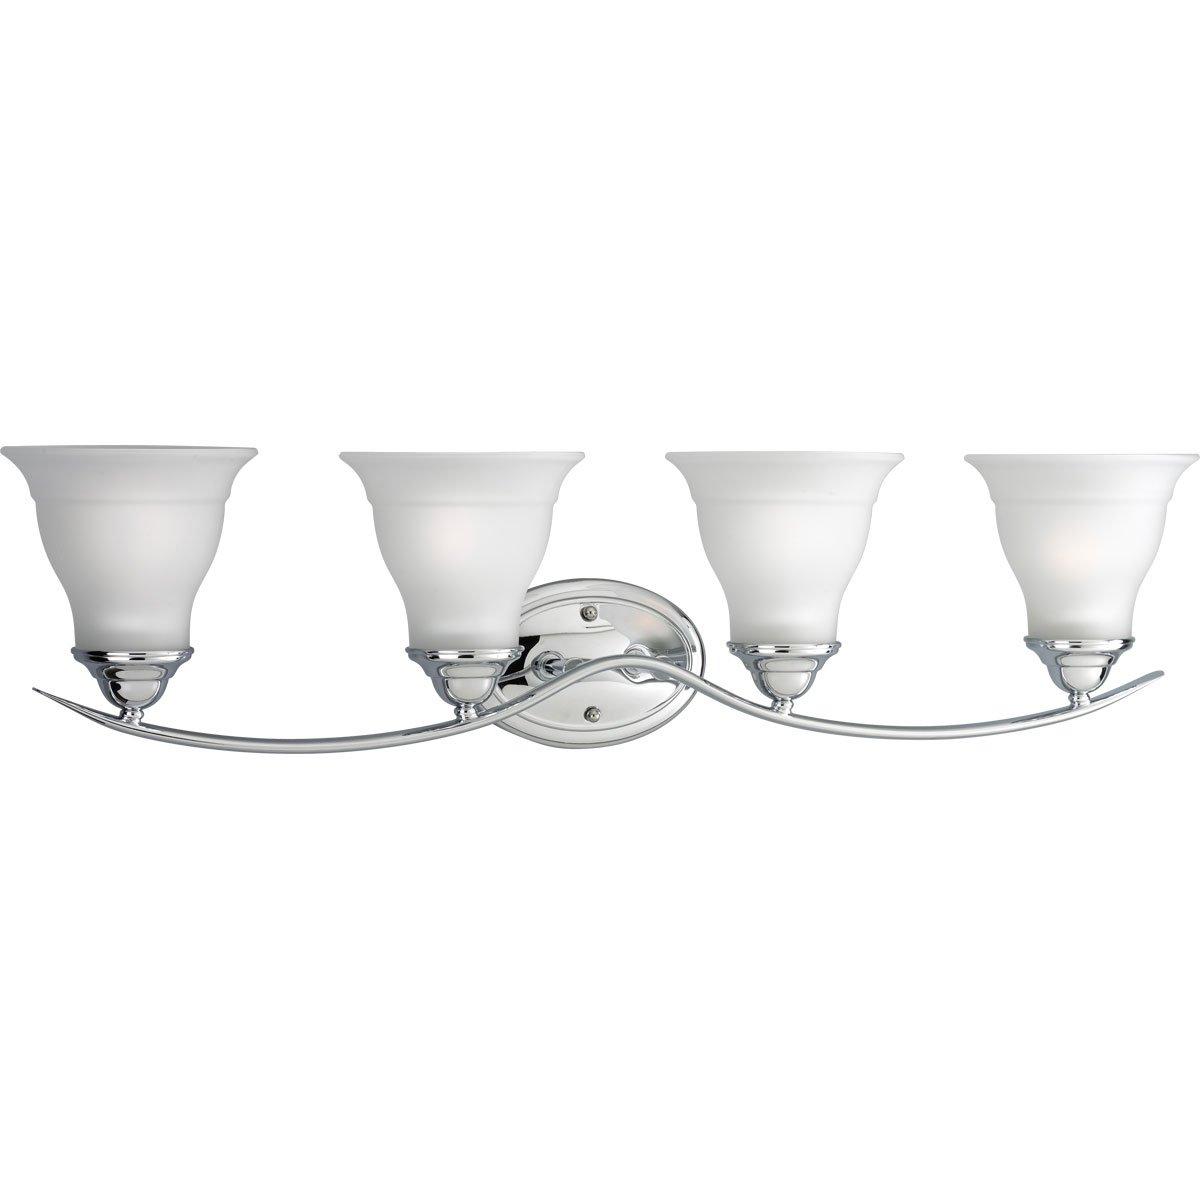 progress lighting p319309 4light bath bracket brushed nickel vanity lighting fixtures amazoncom